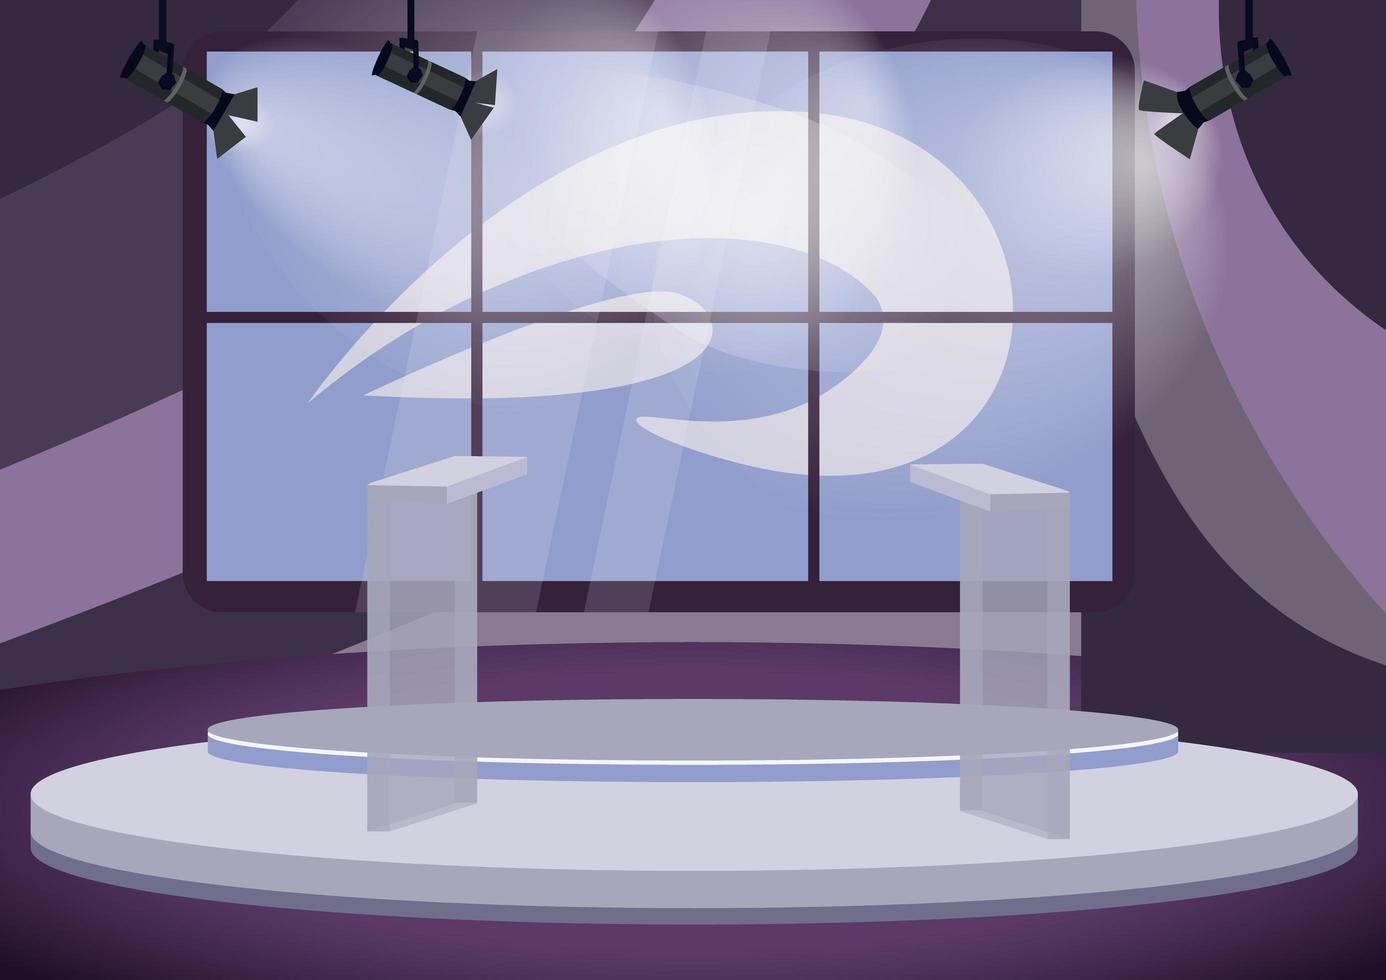 studio de talk-show politique vecteur